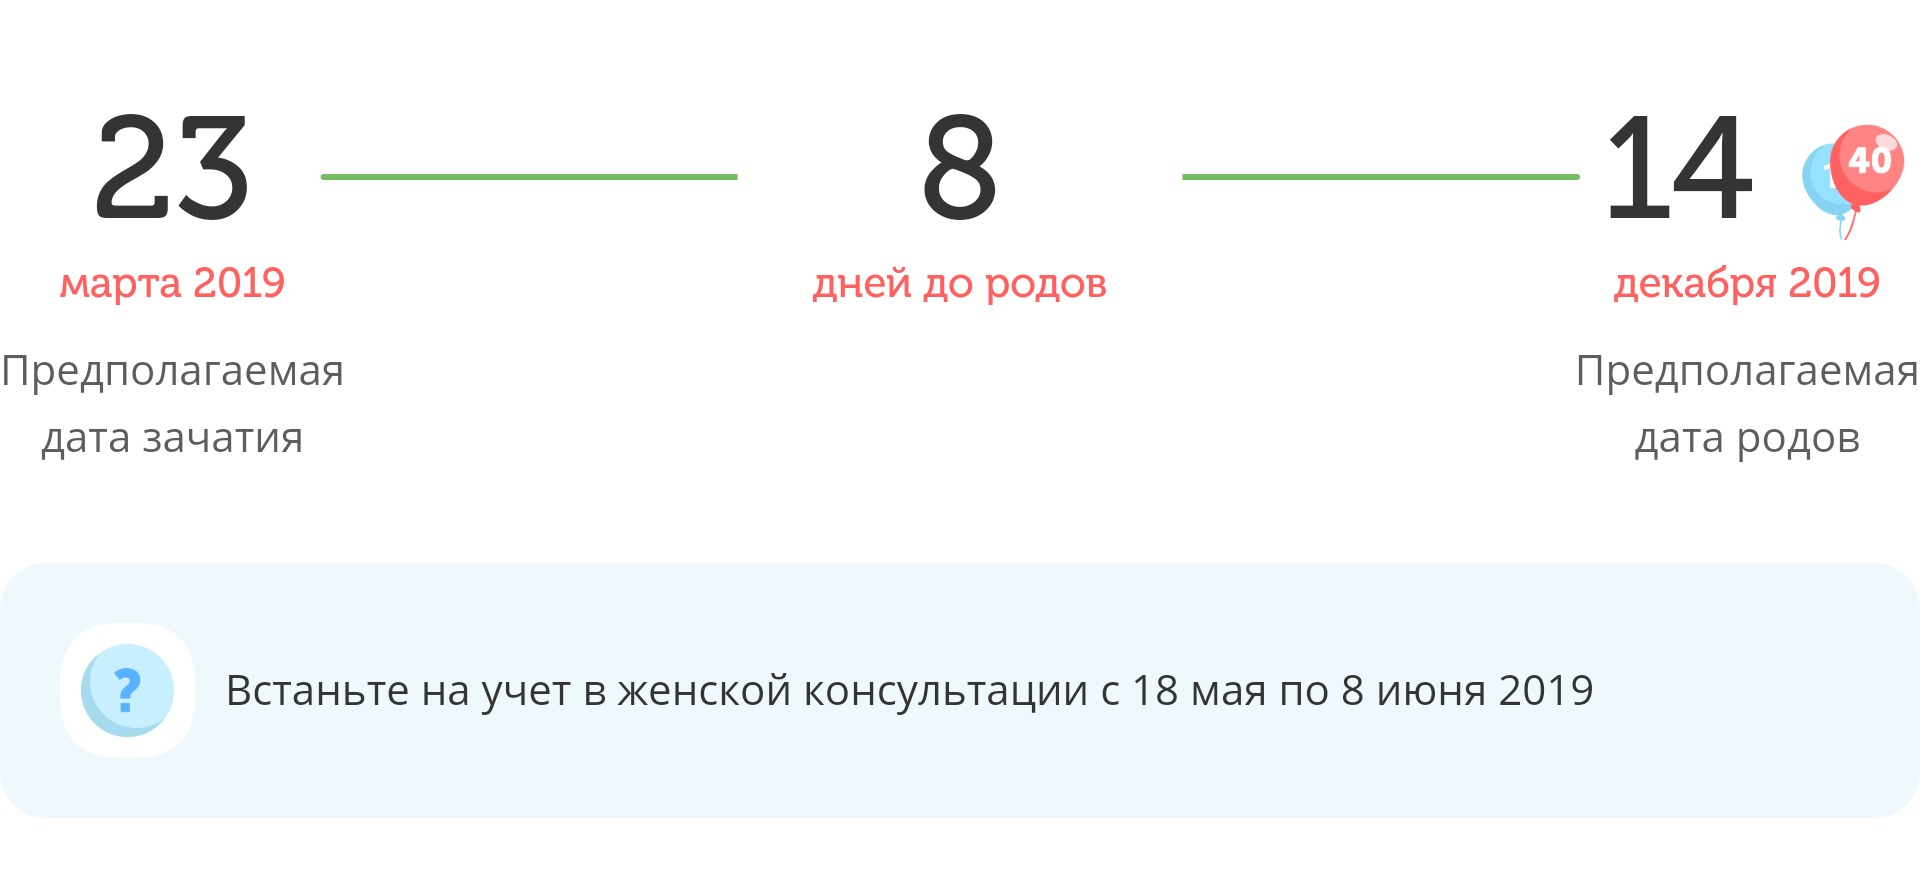 Калькулятор даты родов